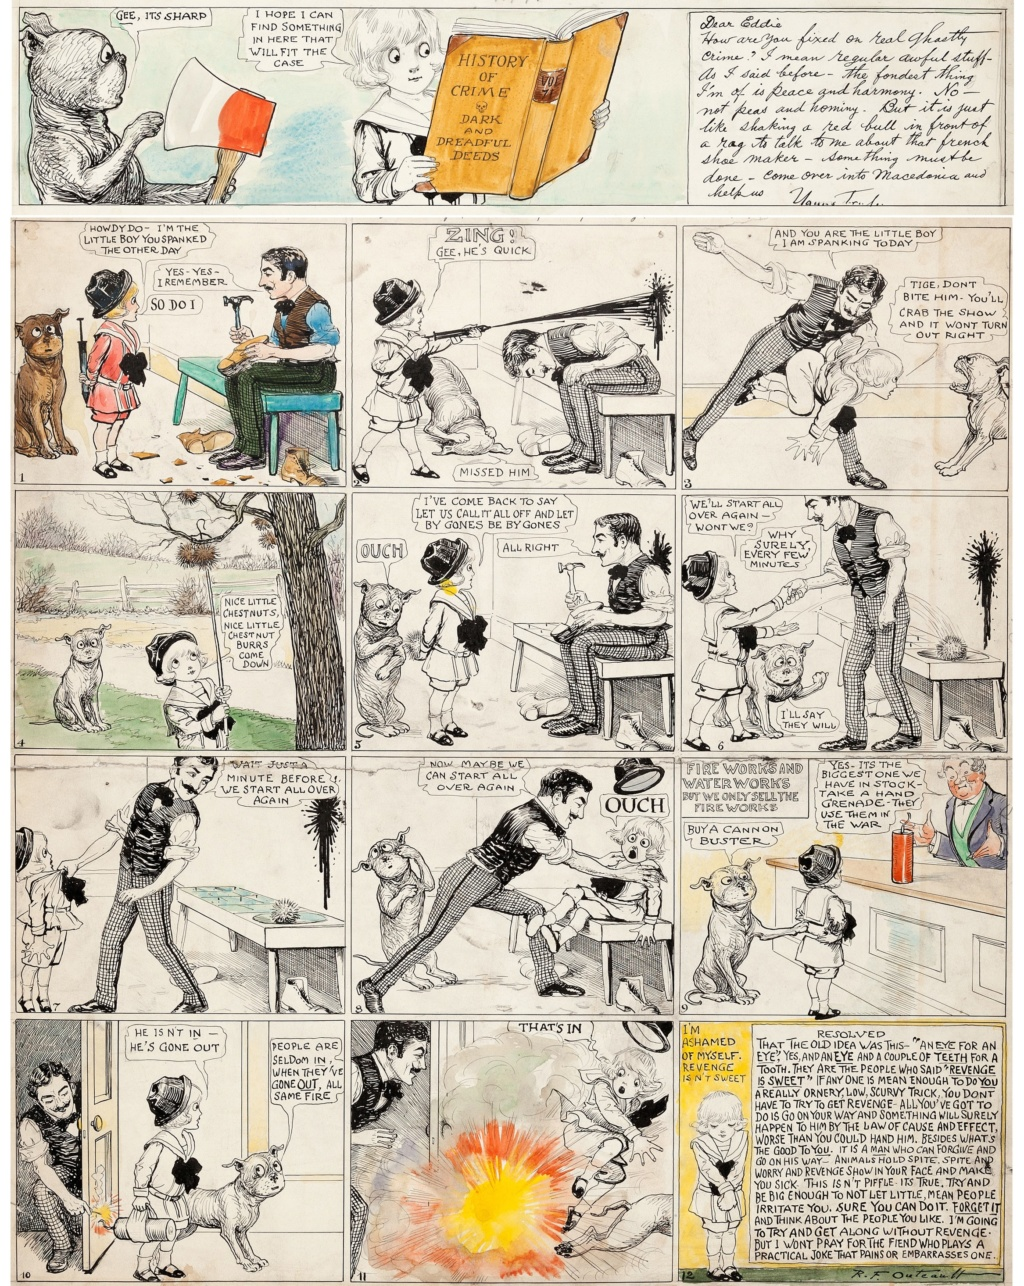 Les facéties de Buster Brown - Page 2 Bbsp1811